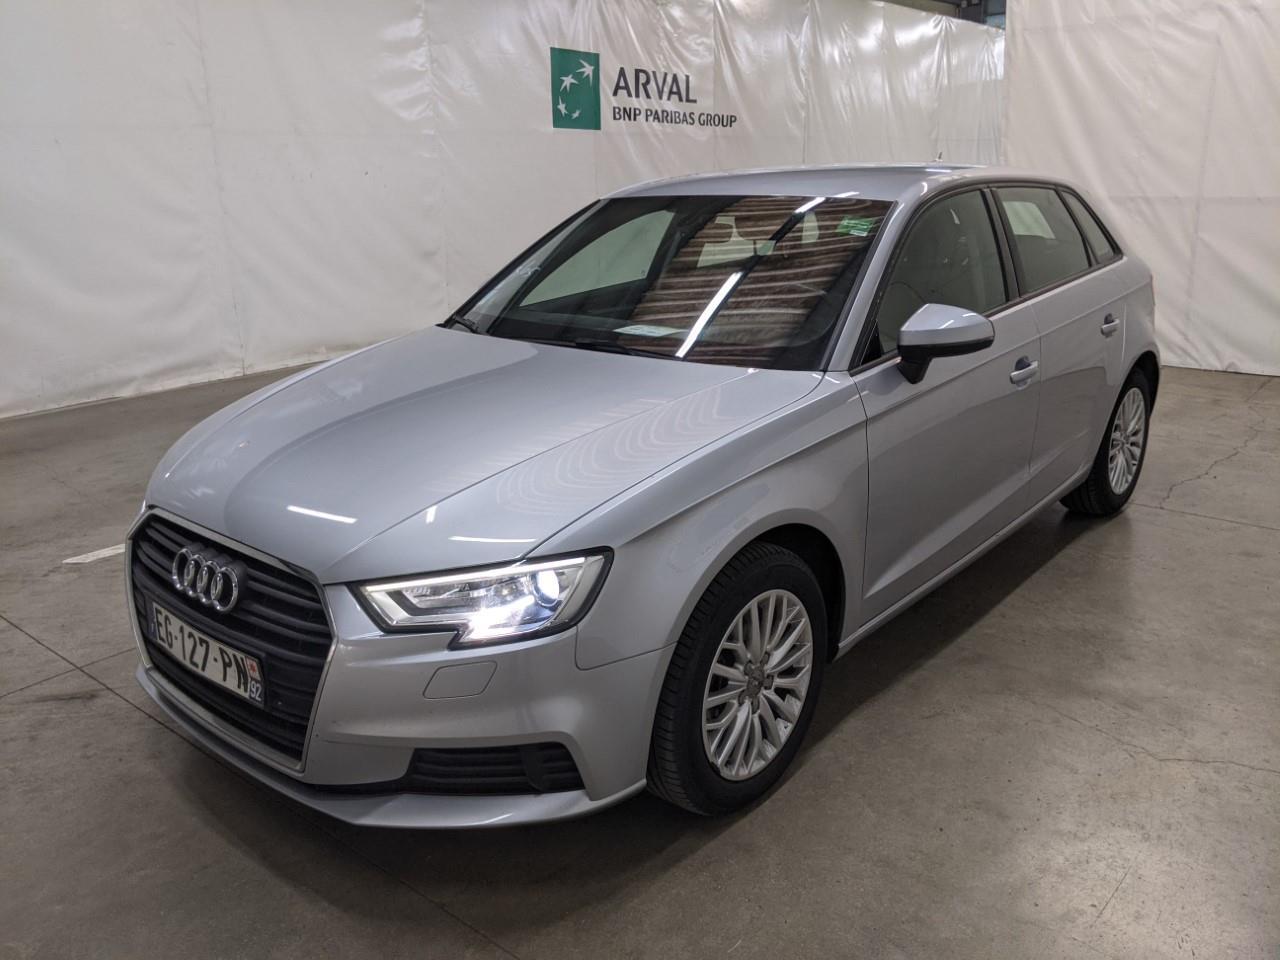 Audi A3 A3 Sportback  BUSINESS LINE 2.0 TDI 150 S TRONIC